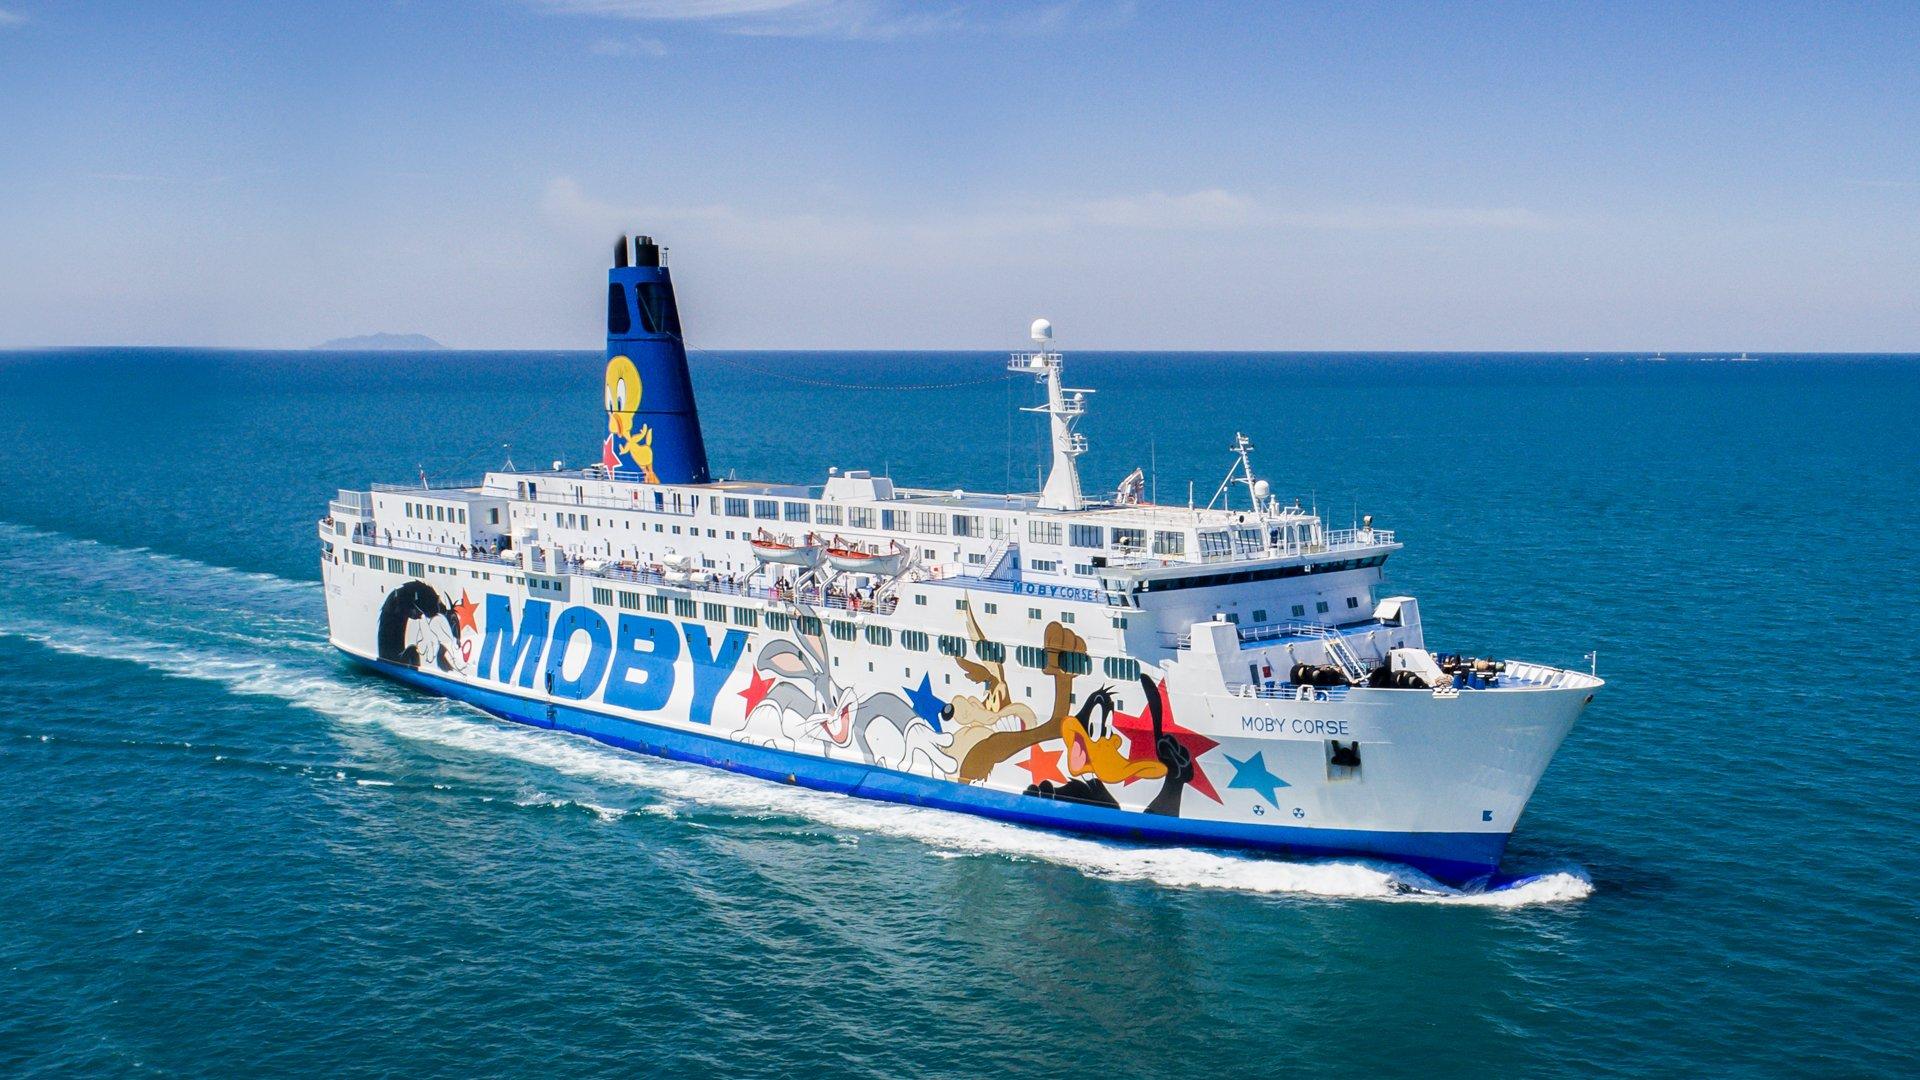 Fähre Moby Corse